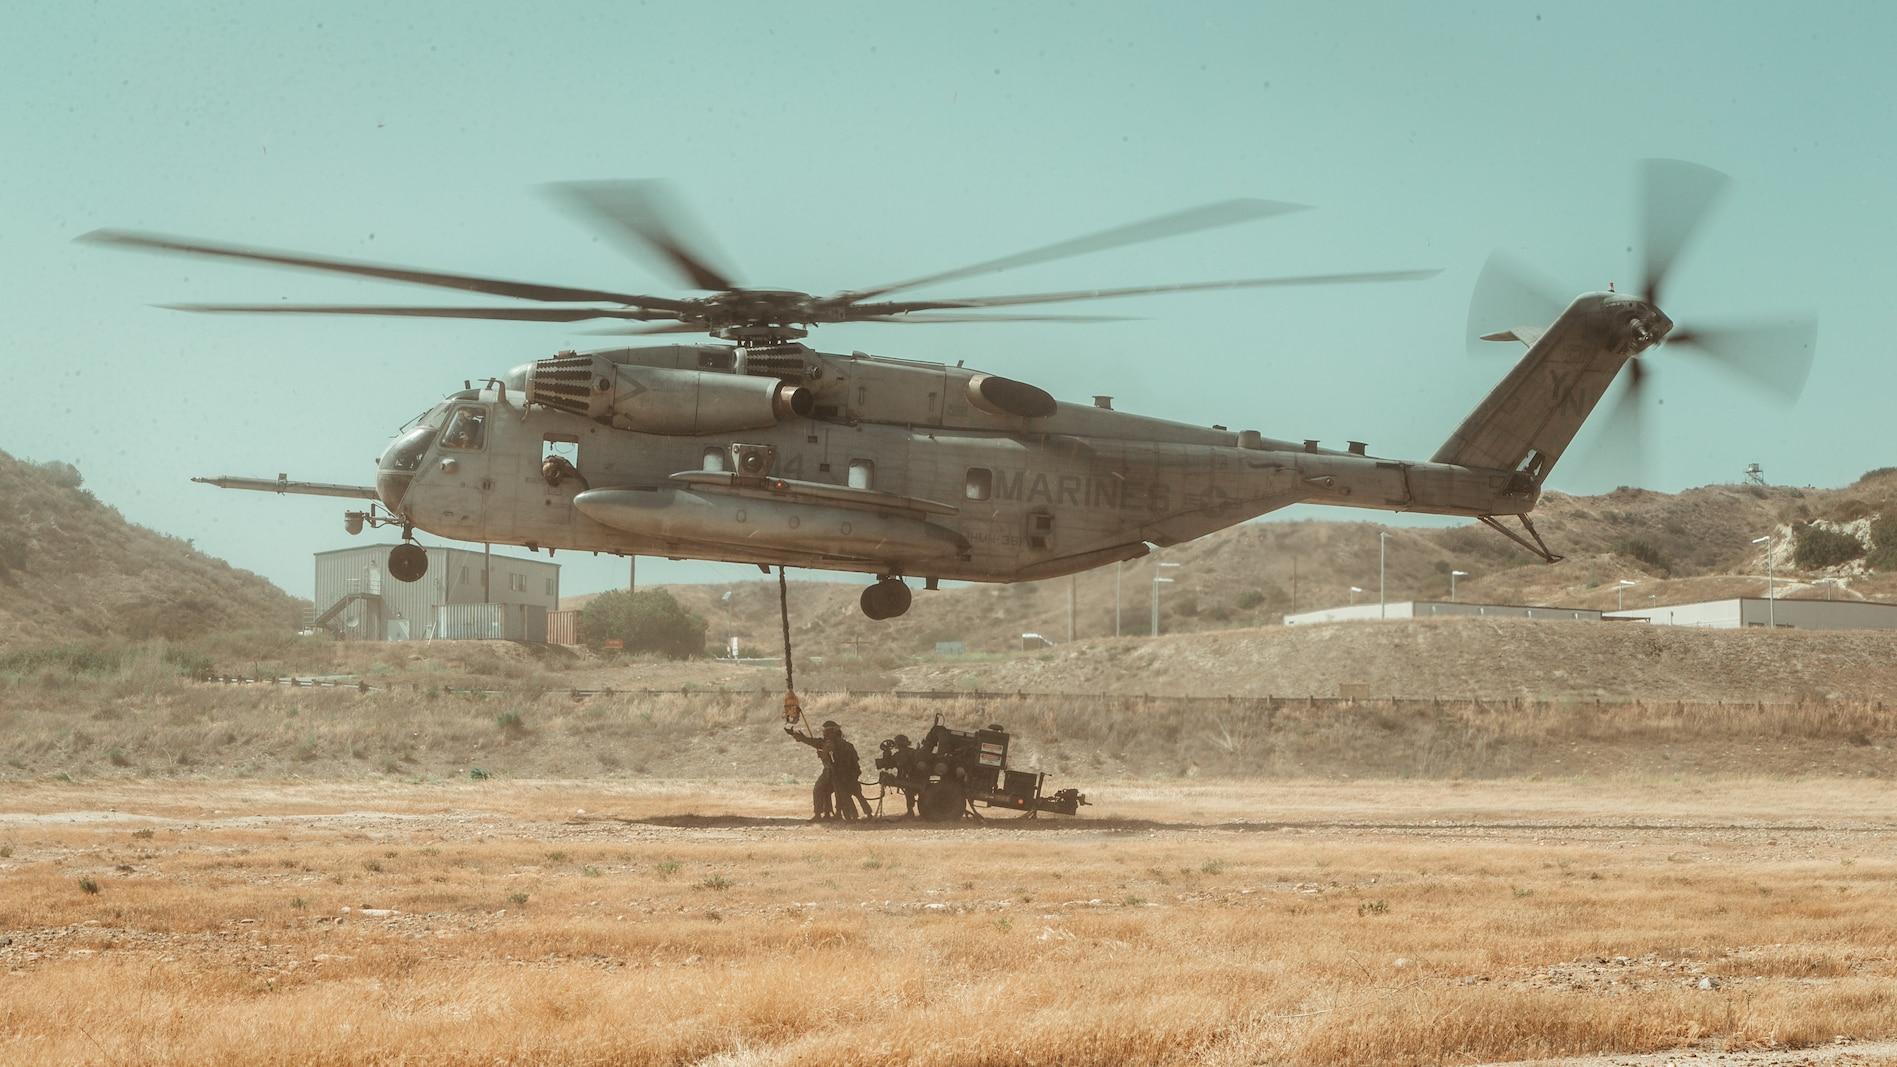 U.S. Marines with 1st Landing Support Battalion conduct an external lift of a bulk fuel pump